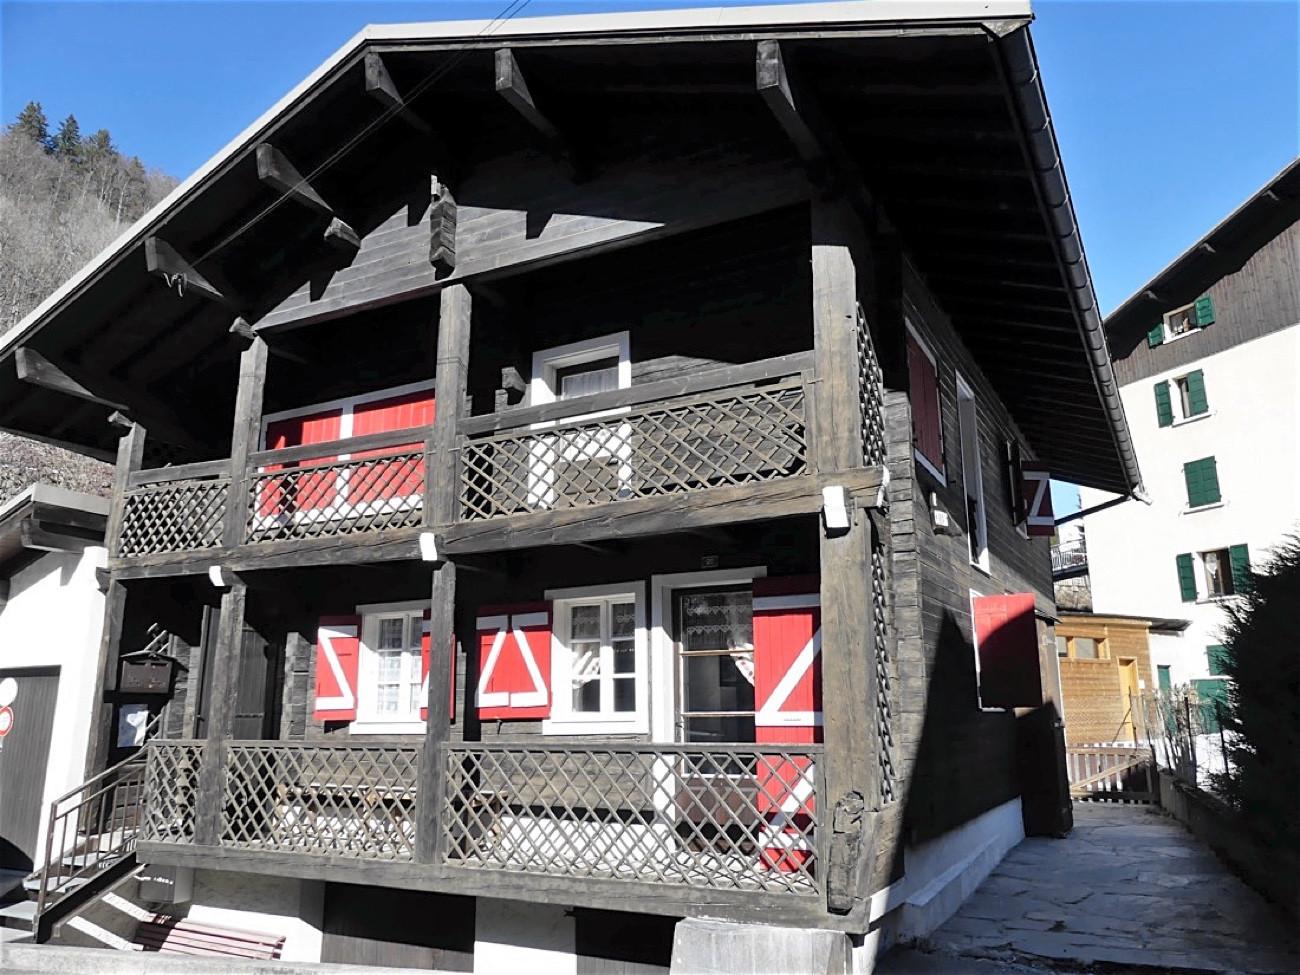 Villa in La Clusaz - Cotterg - Chalet for 15 people 2* in the village